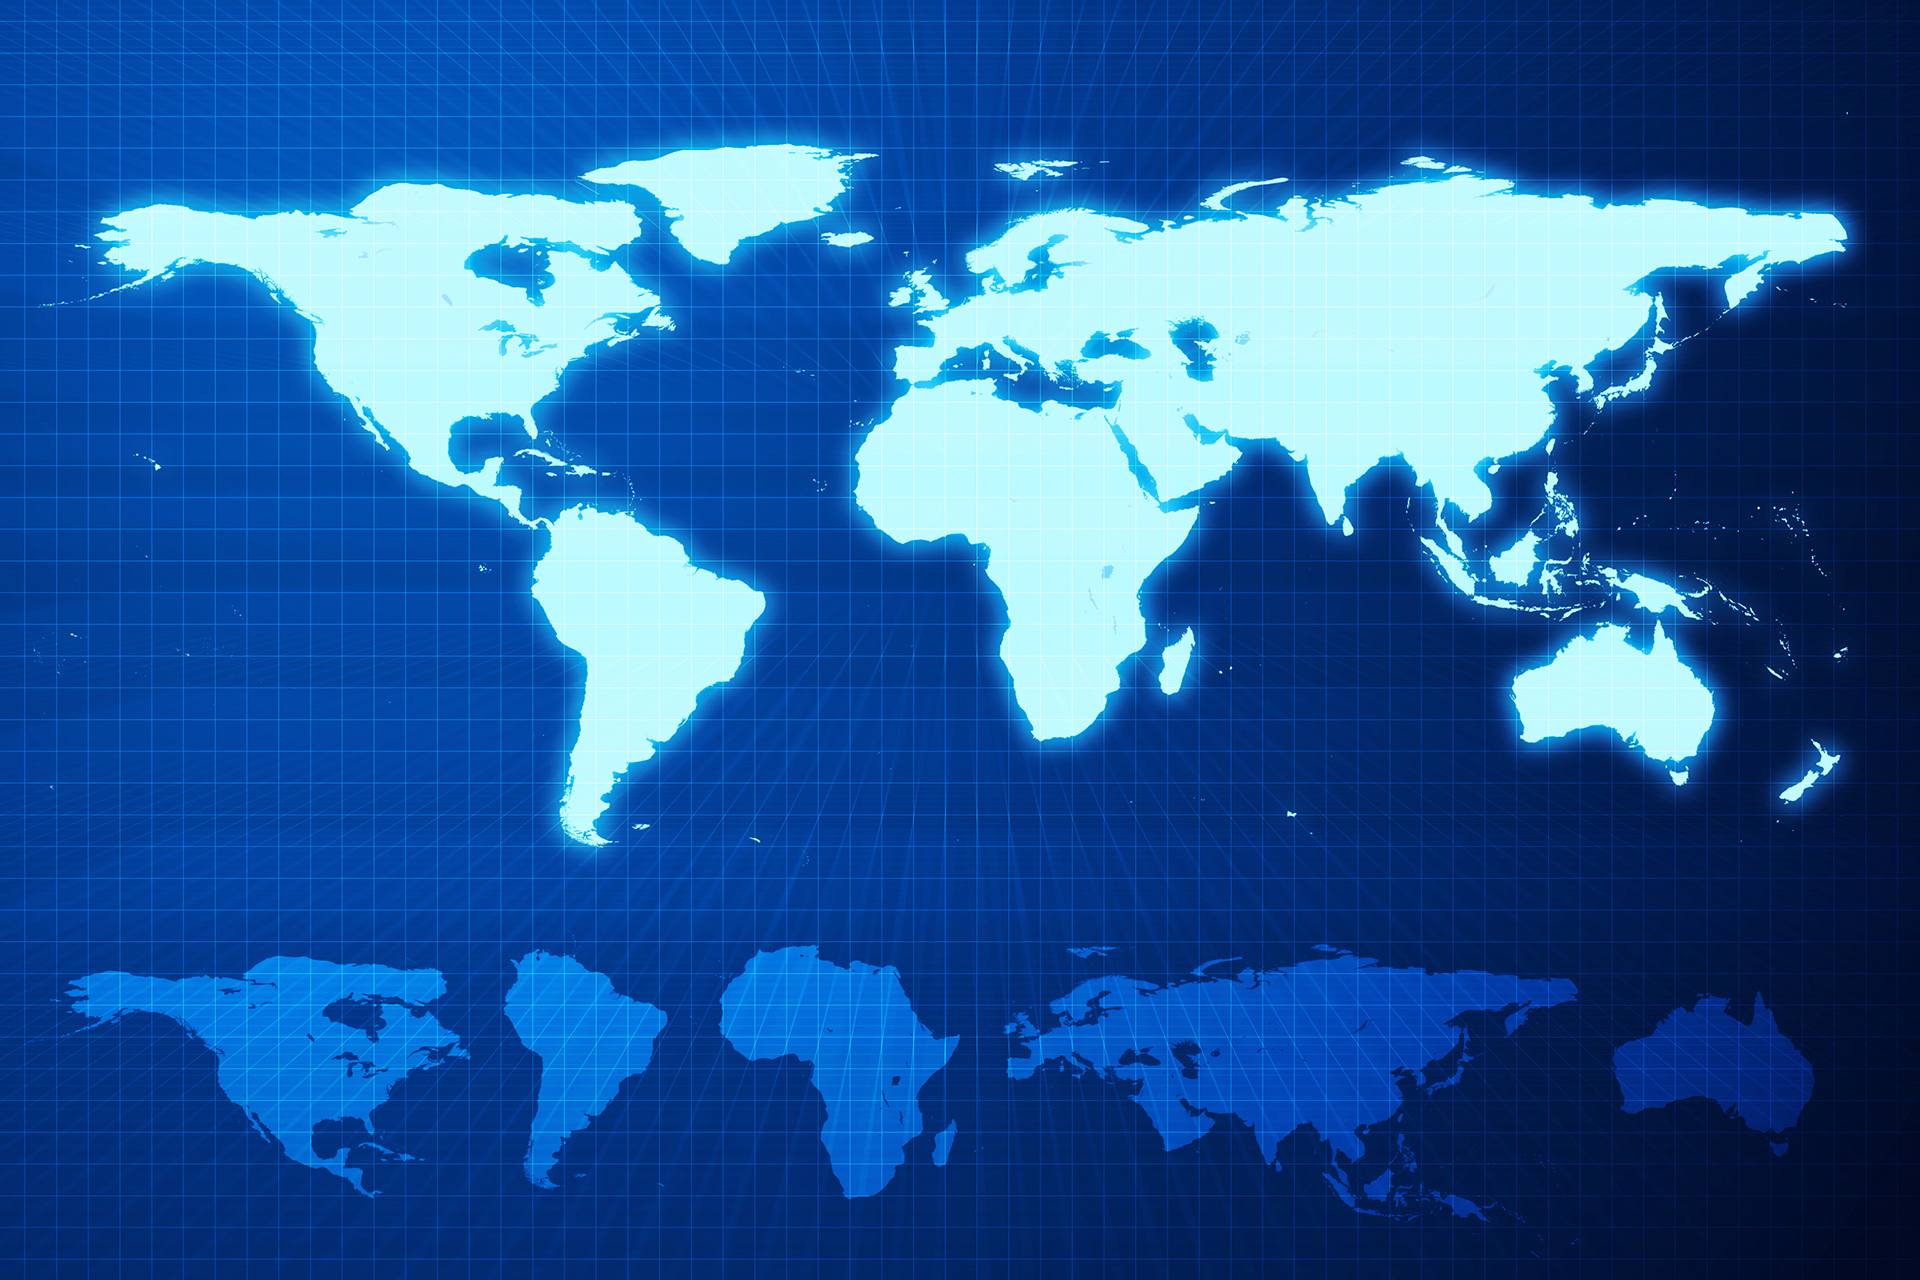 World map by hekee on deviantart digital world map by hekee digital world map by hekee gumiabroncs Gallery